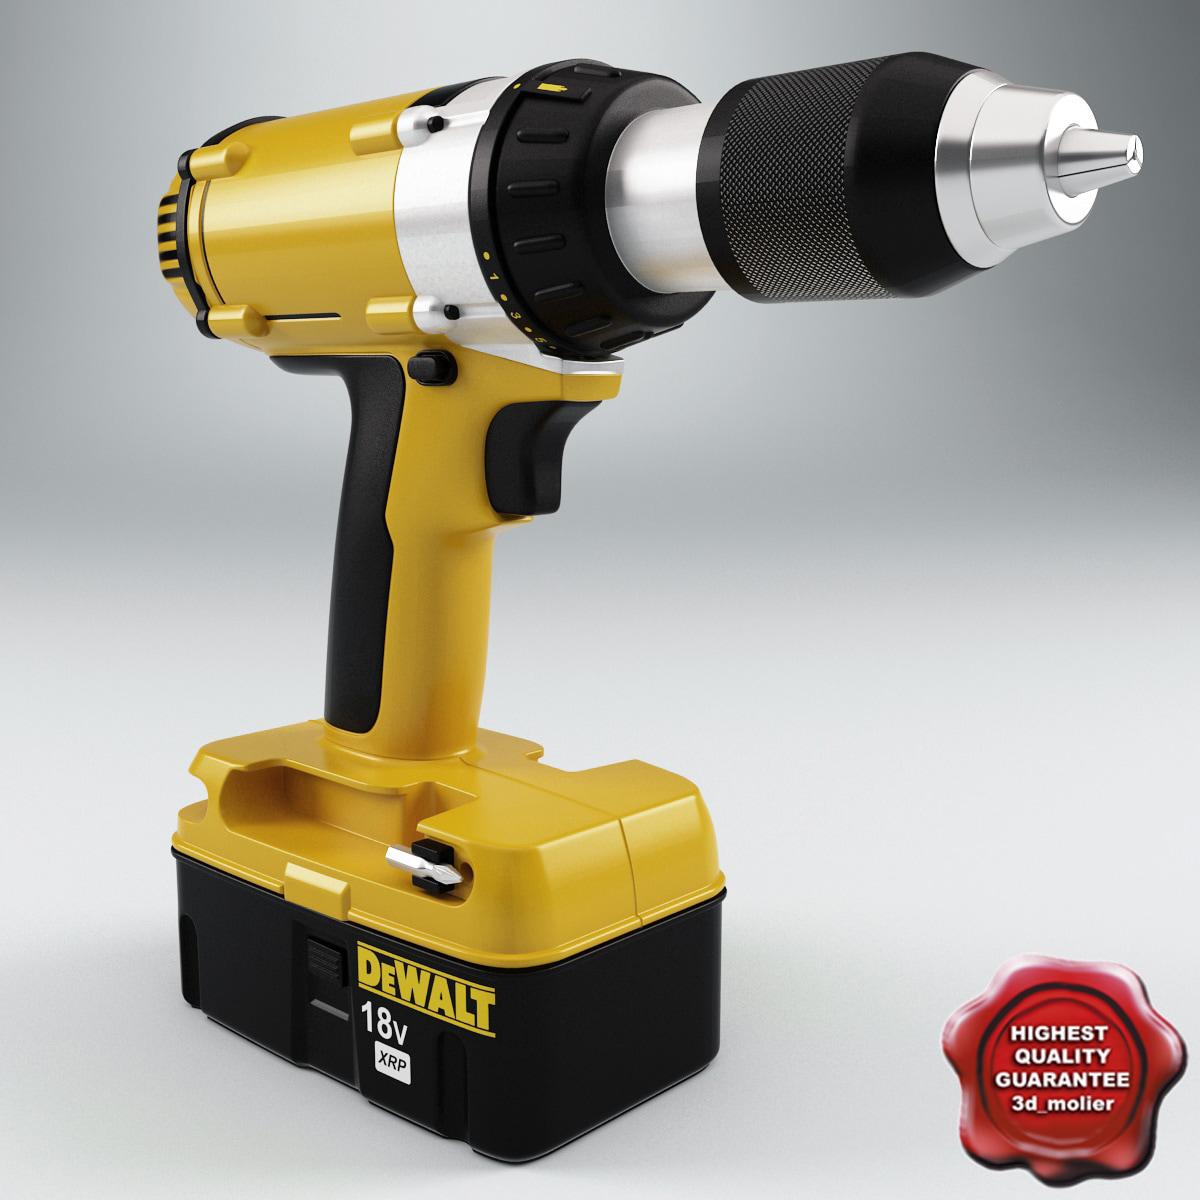 3ds max drill dewalt dc987 v2